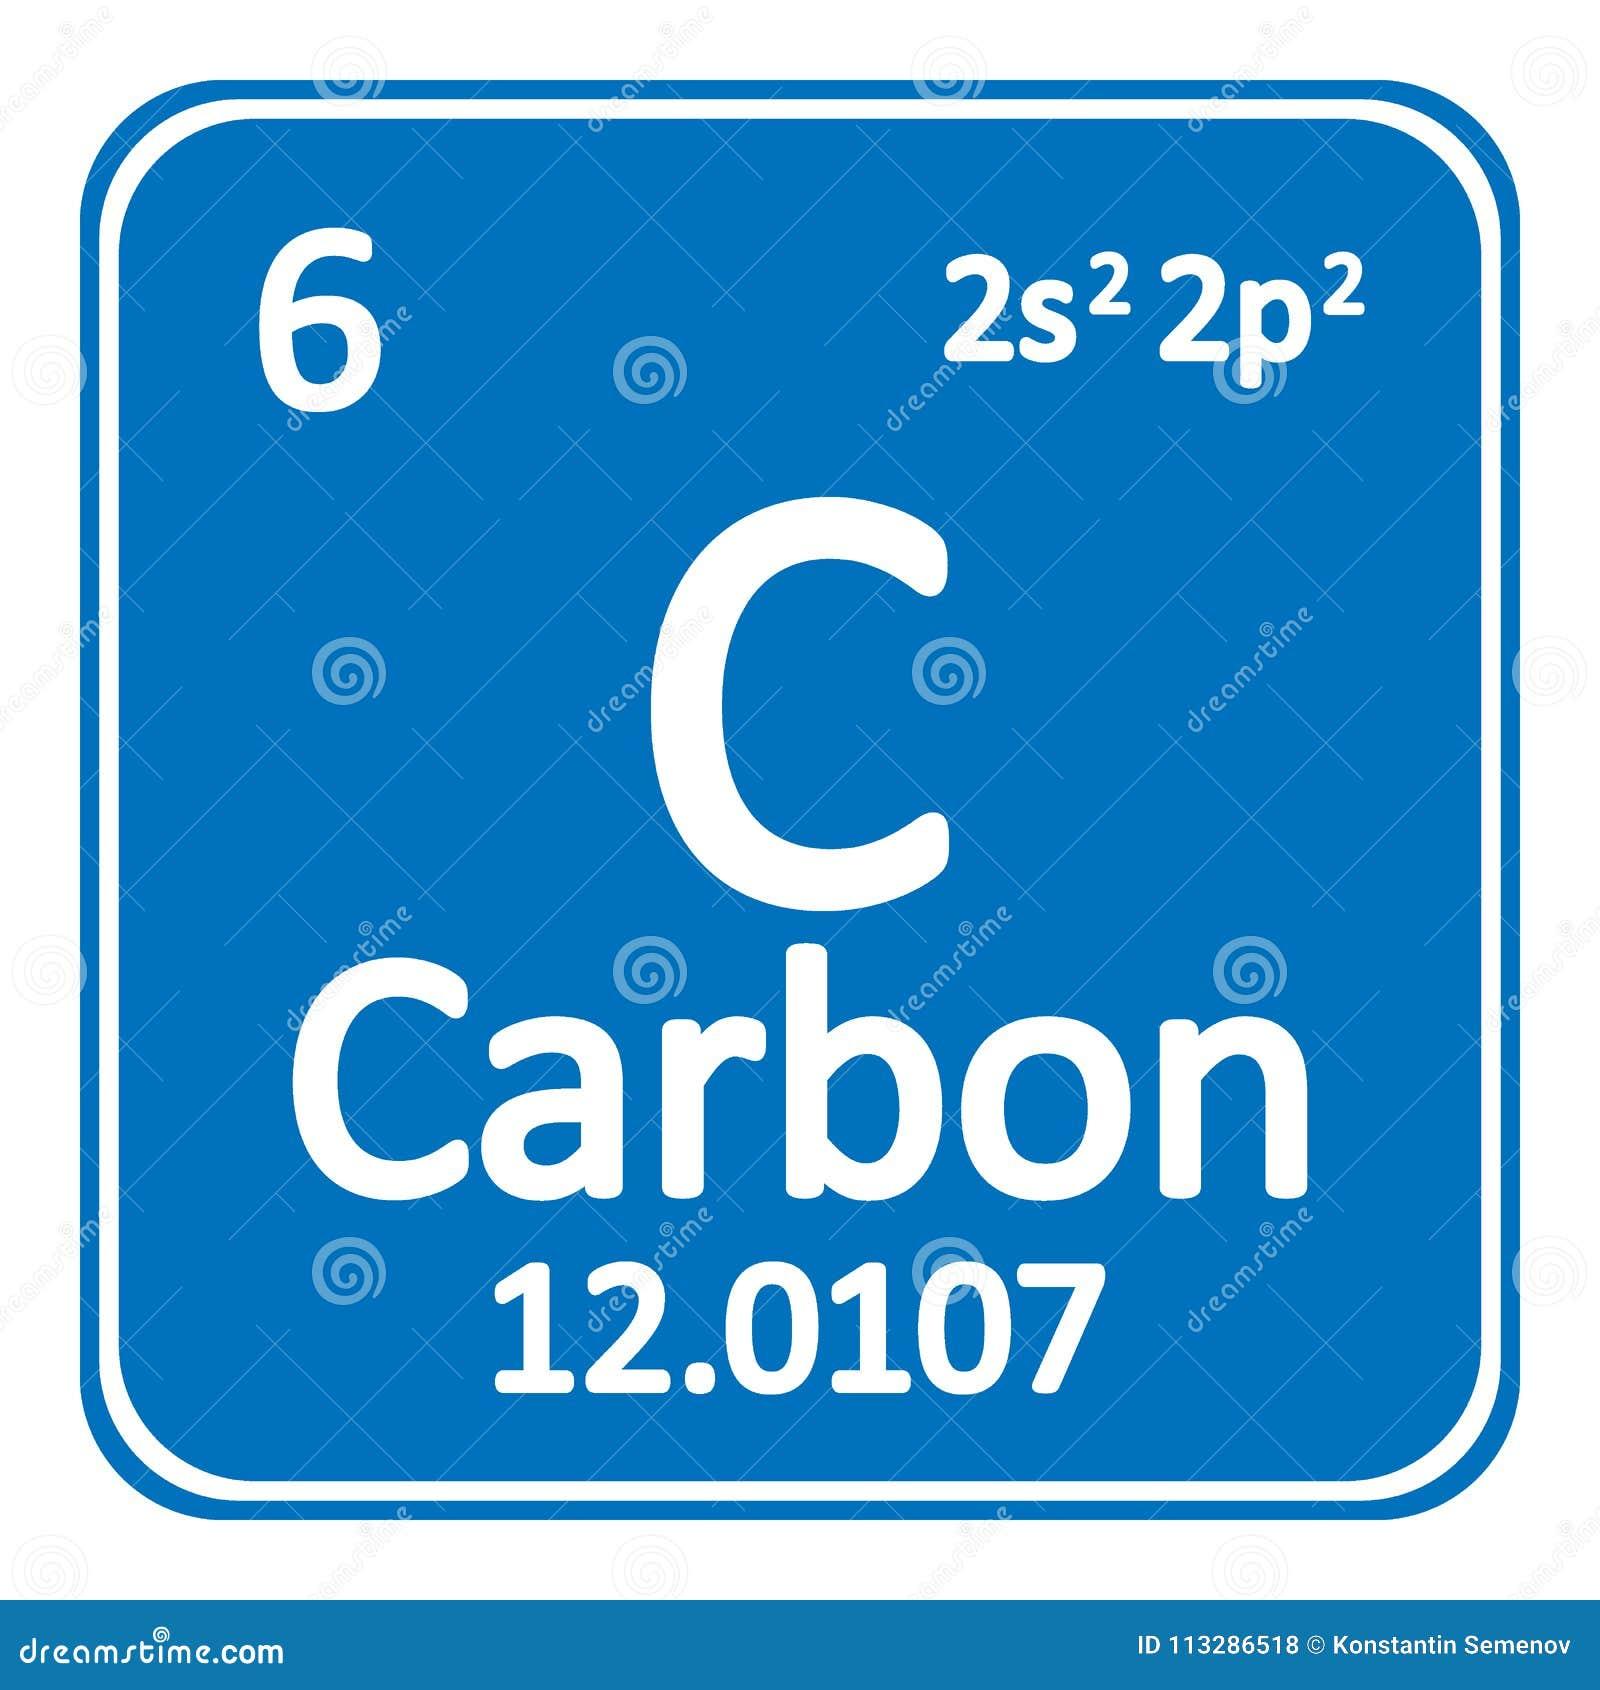 Periodic table element carbon icon stock illustration download periodic table element carbon icon stock illustration illustration of chemical graphic urtaz Choice Image